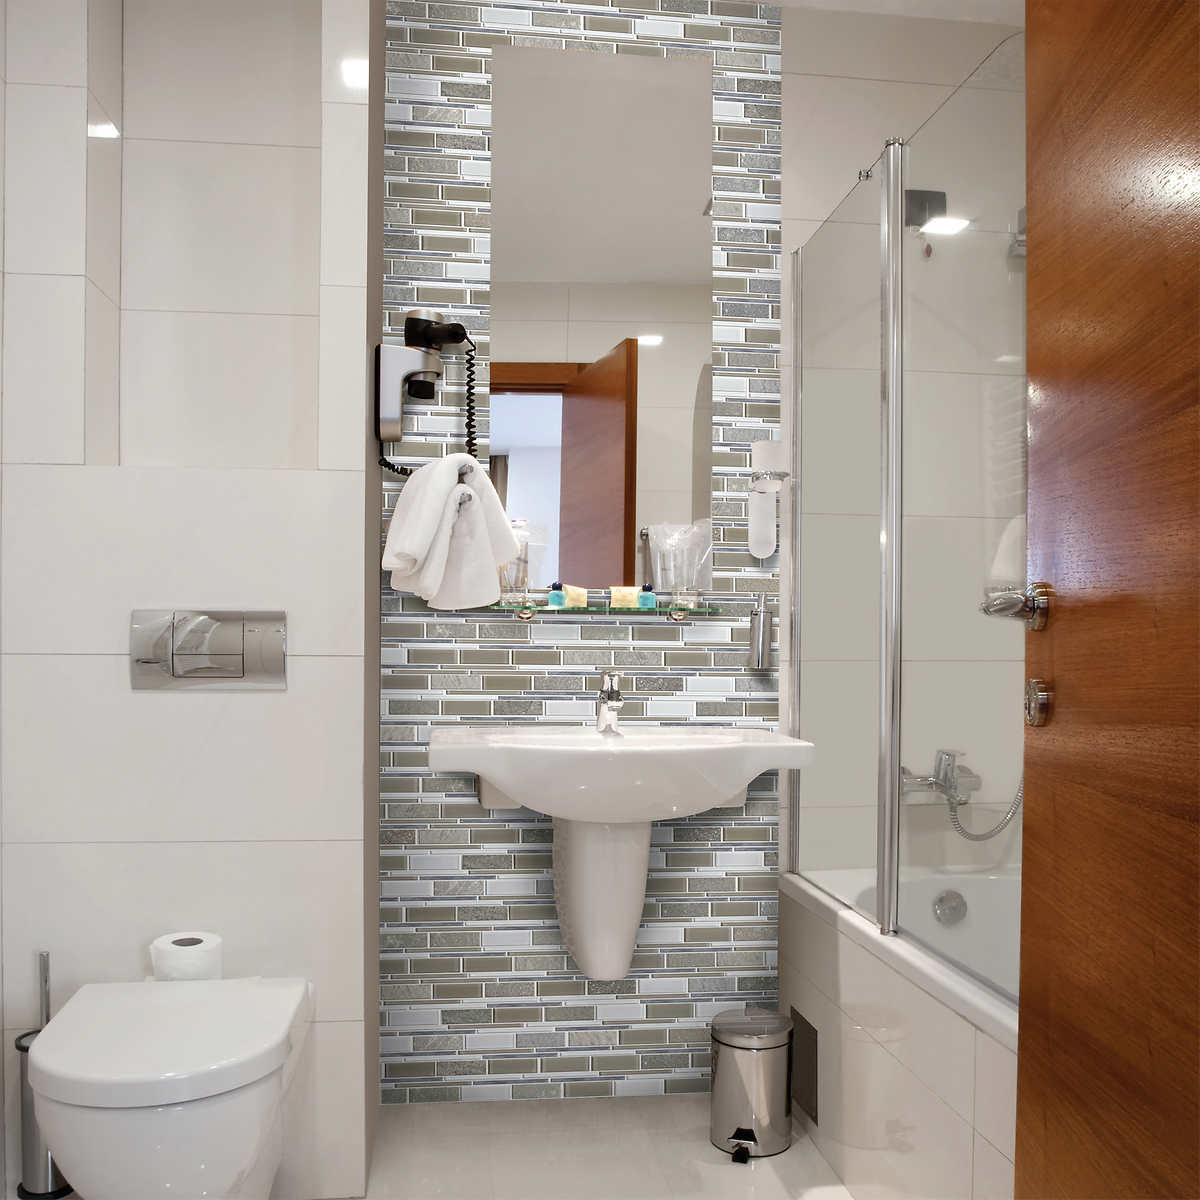 Awe Inspiring Golden Select Colorado Glass And Stone Mosaic Wall Tile Interior Design Ideas Helimdqseriescom